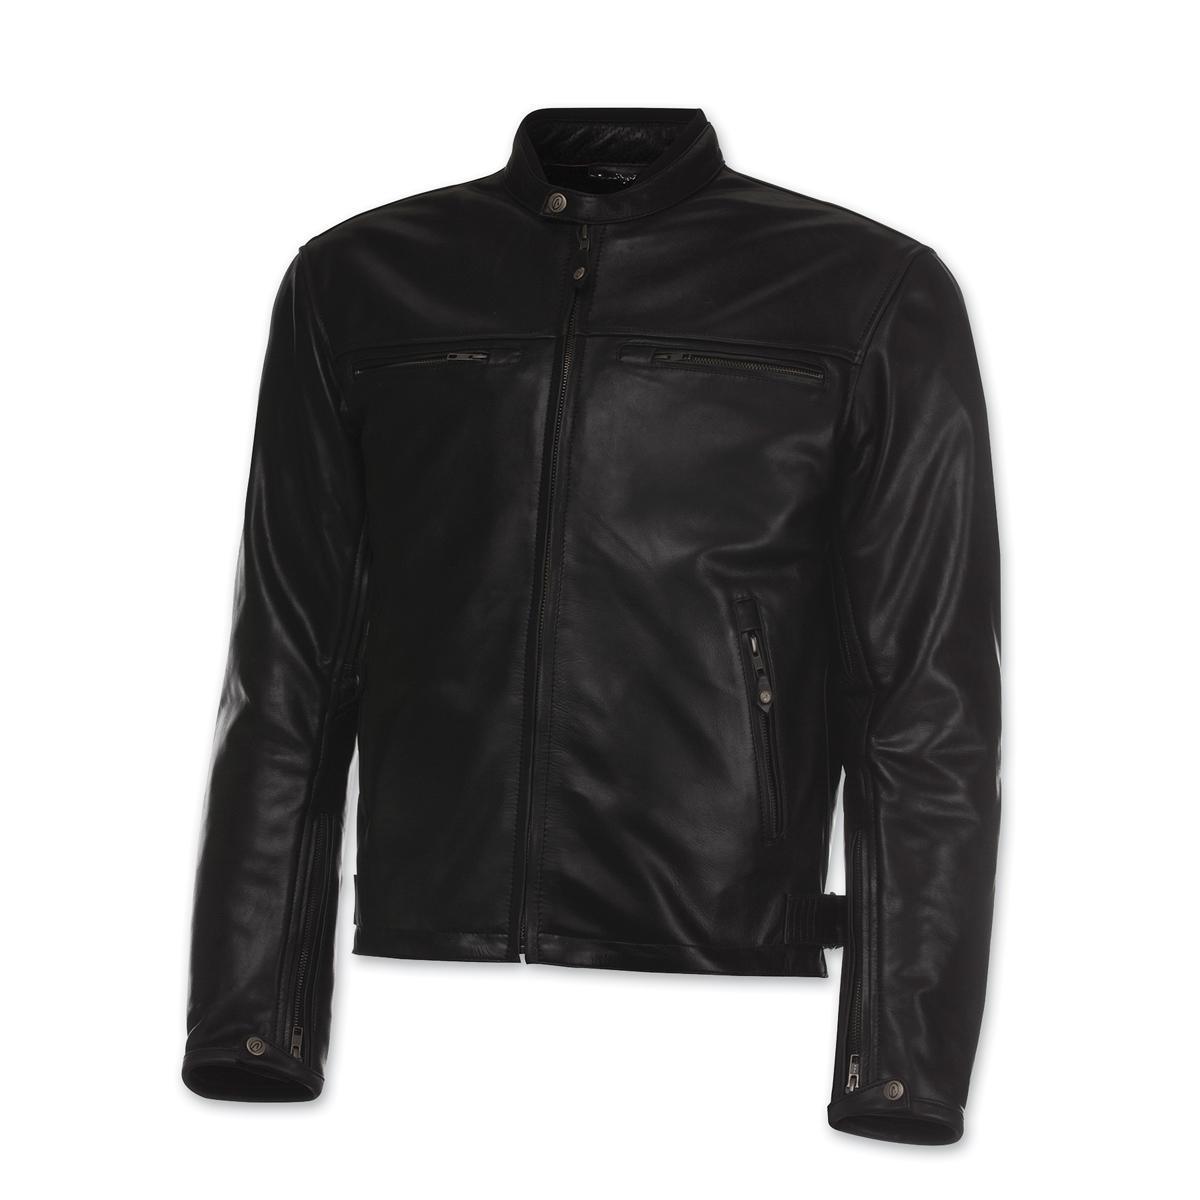 Olympia Moto Sports Men's Bishop Black Leather Jacket